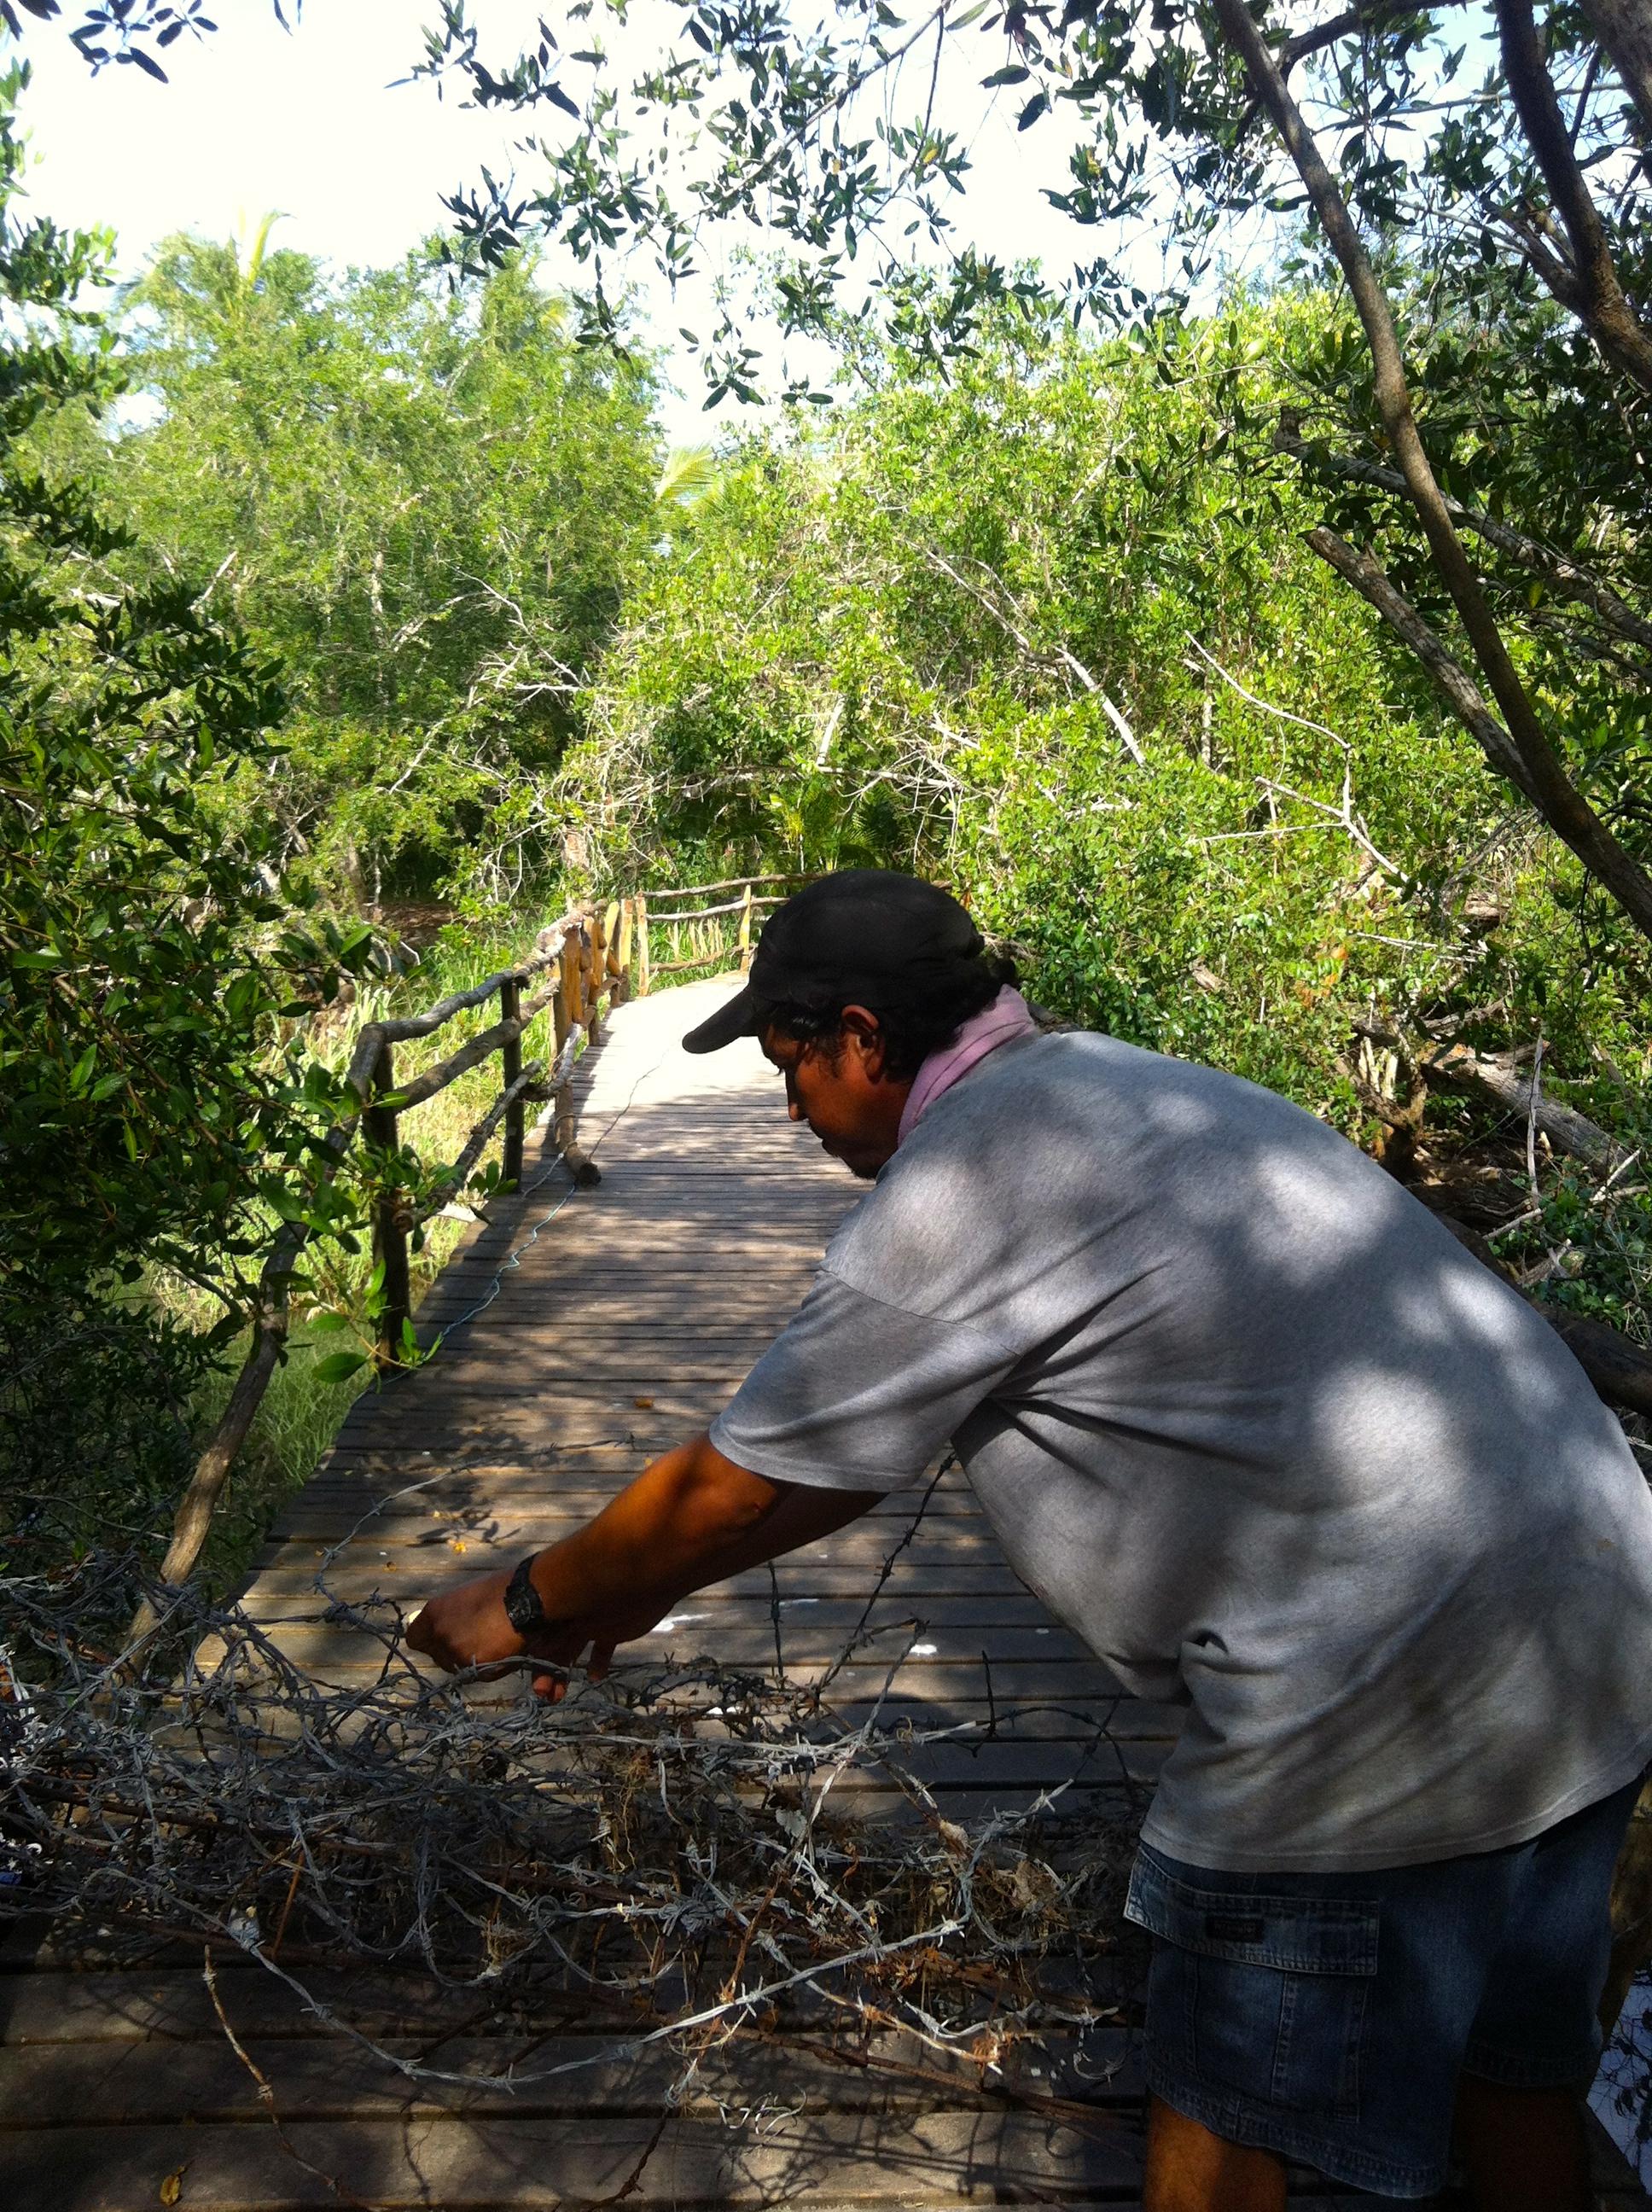 Alejandro showing us the iguanas and crocs